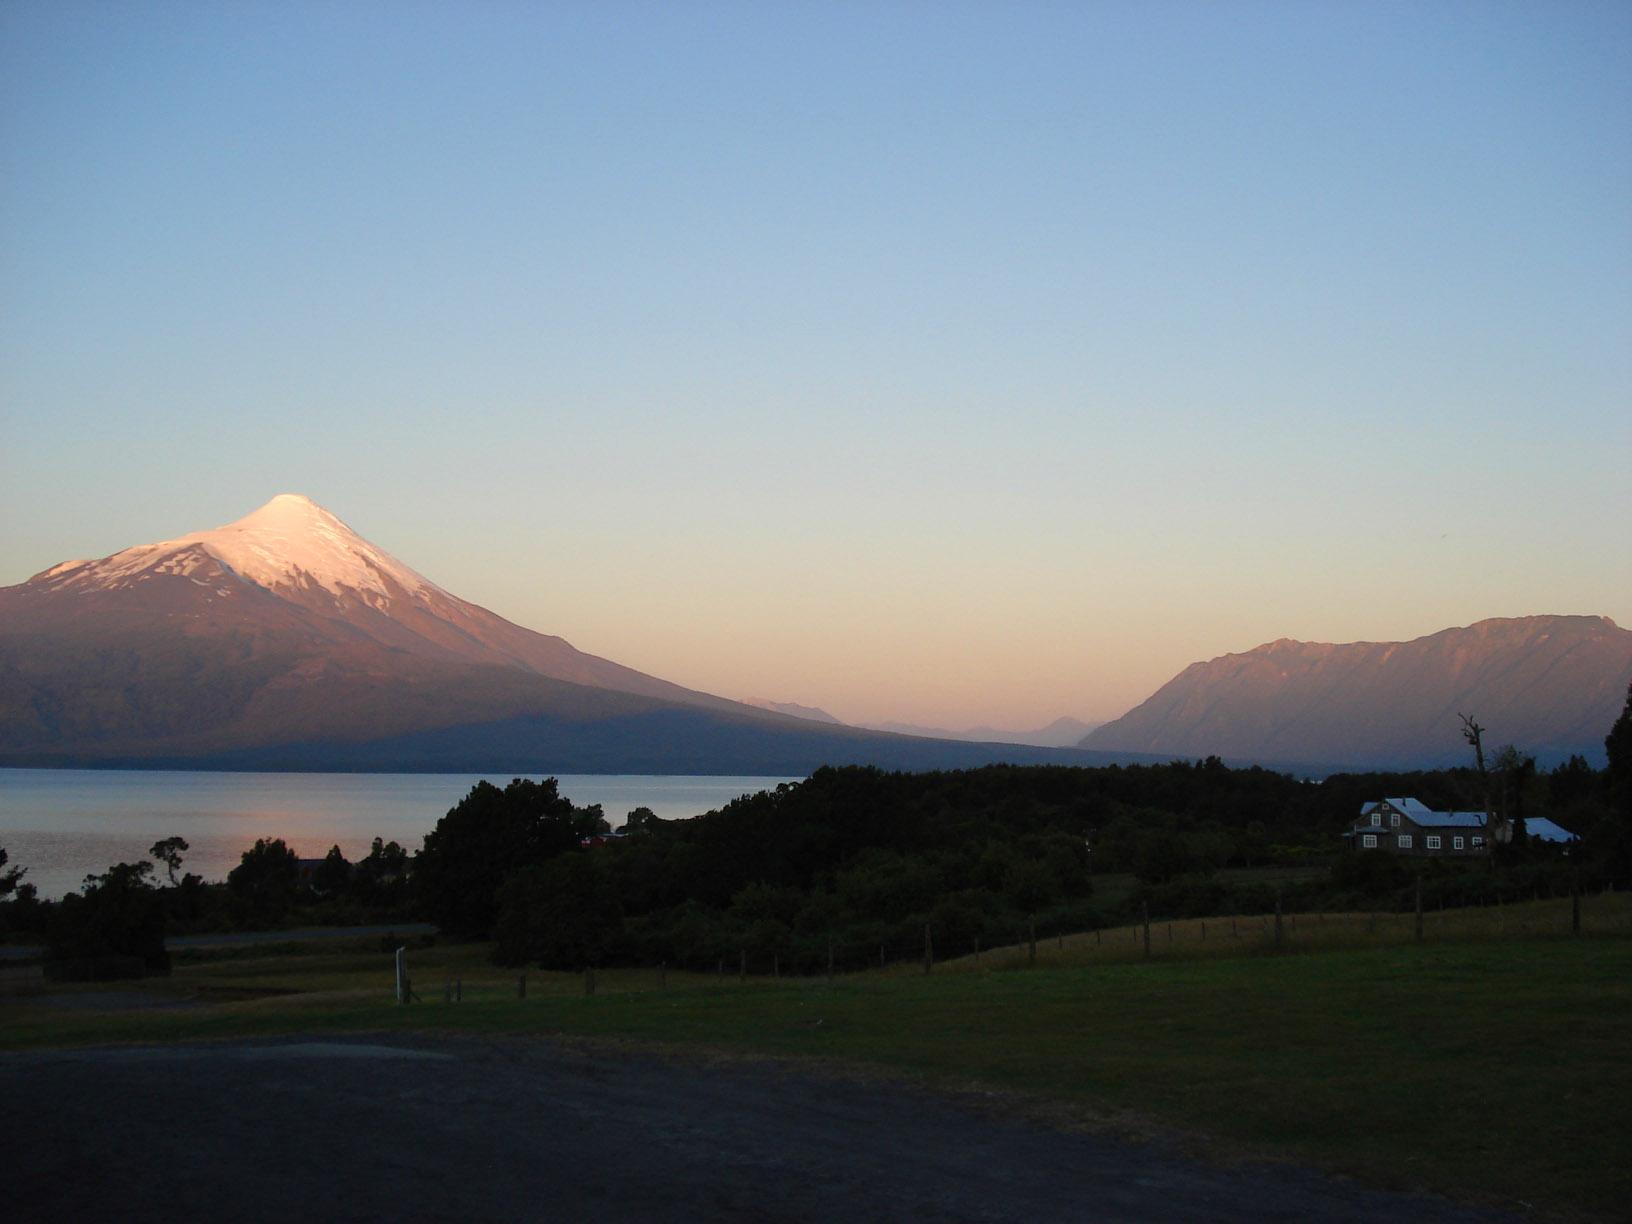 Vulcán Osorno over Lago Llanquihue by payayita